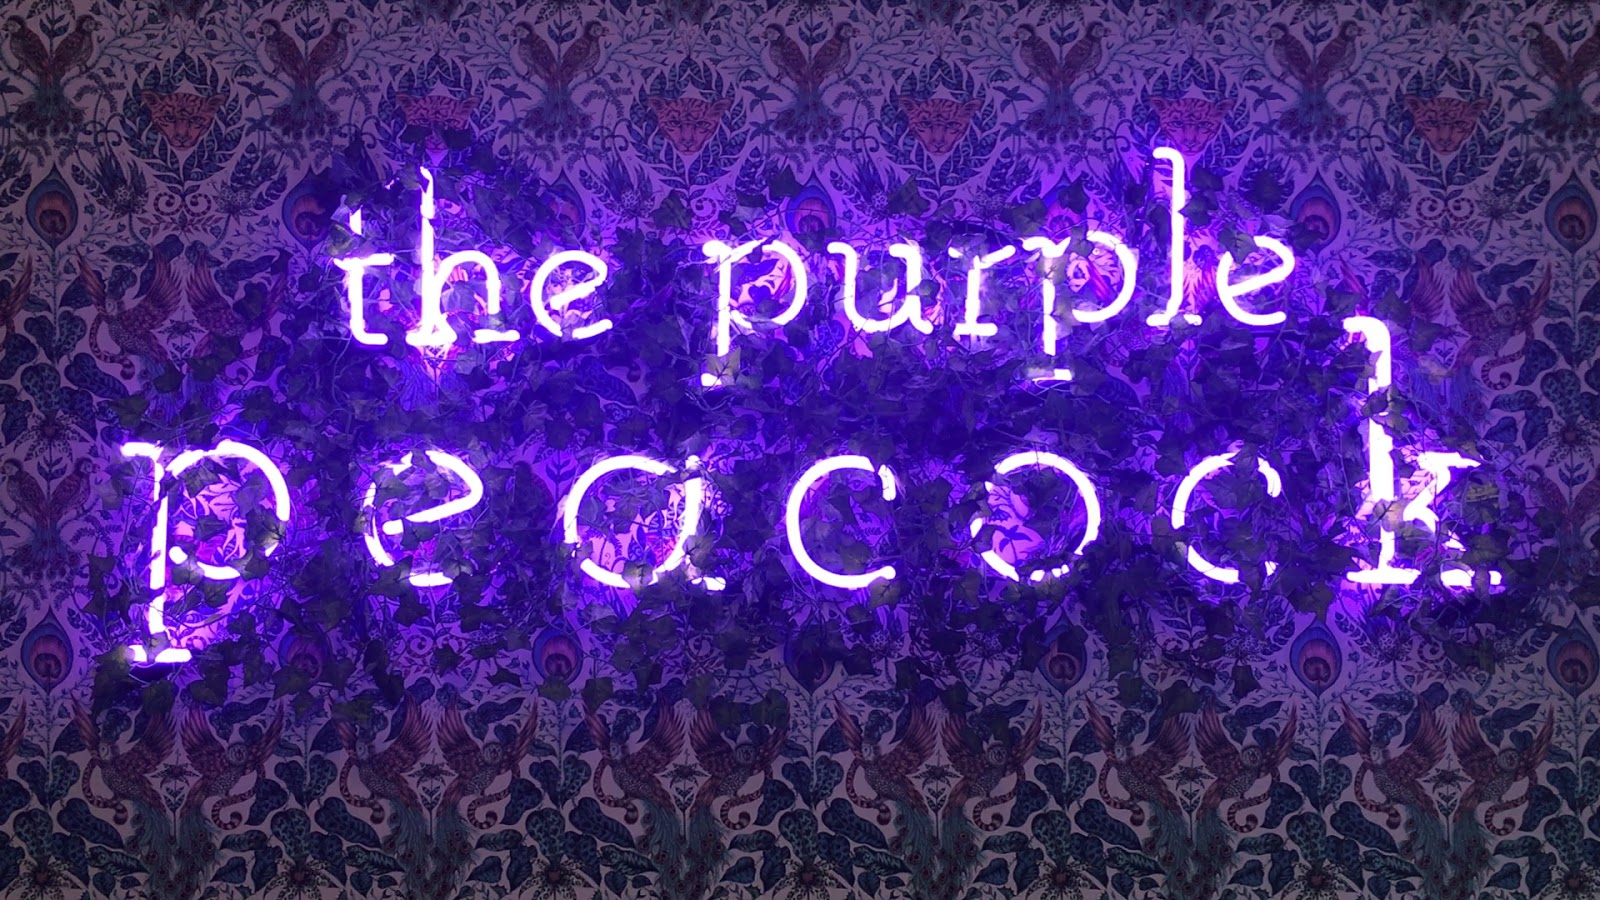 The Purple Peacock